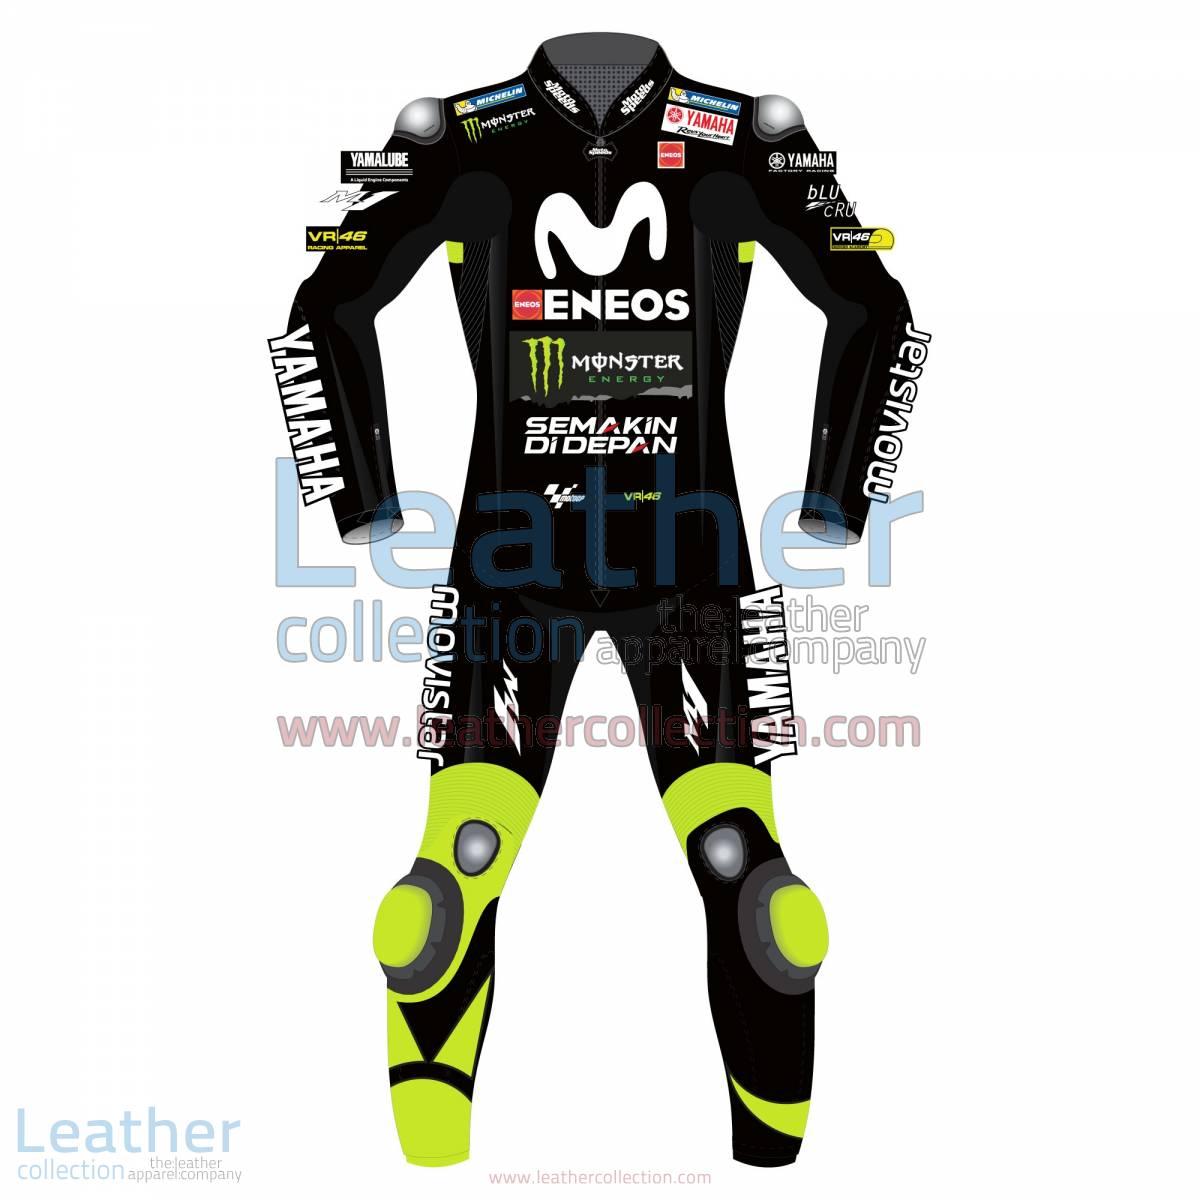 Valentino Rossi Movistar Yamaha 2018 Suit in Black | valentino rossi suit